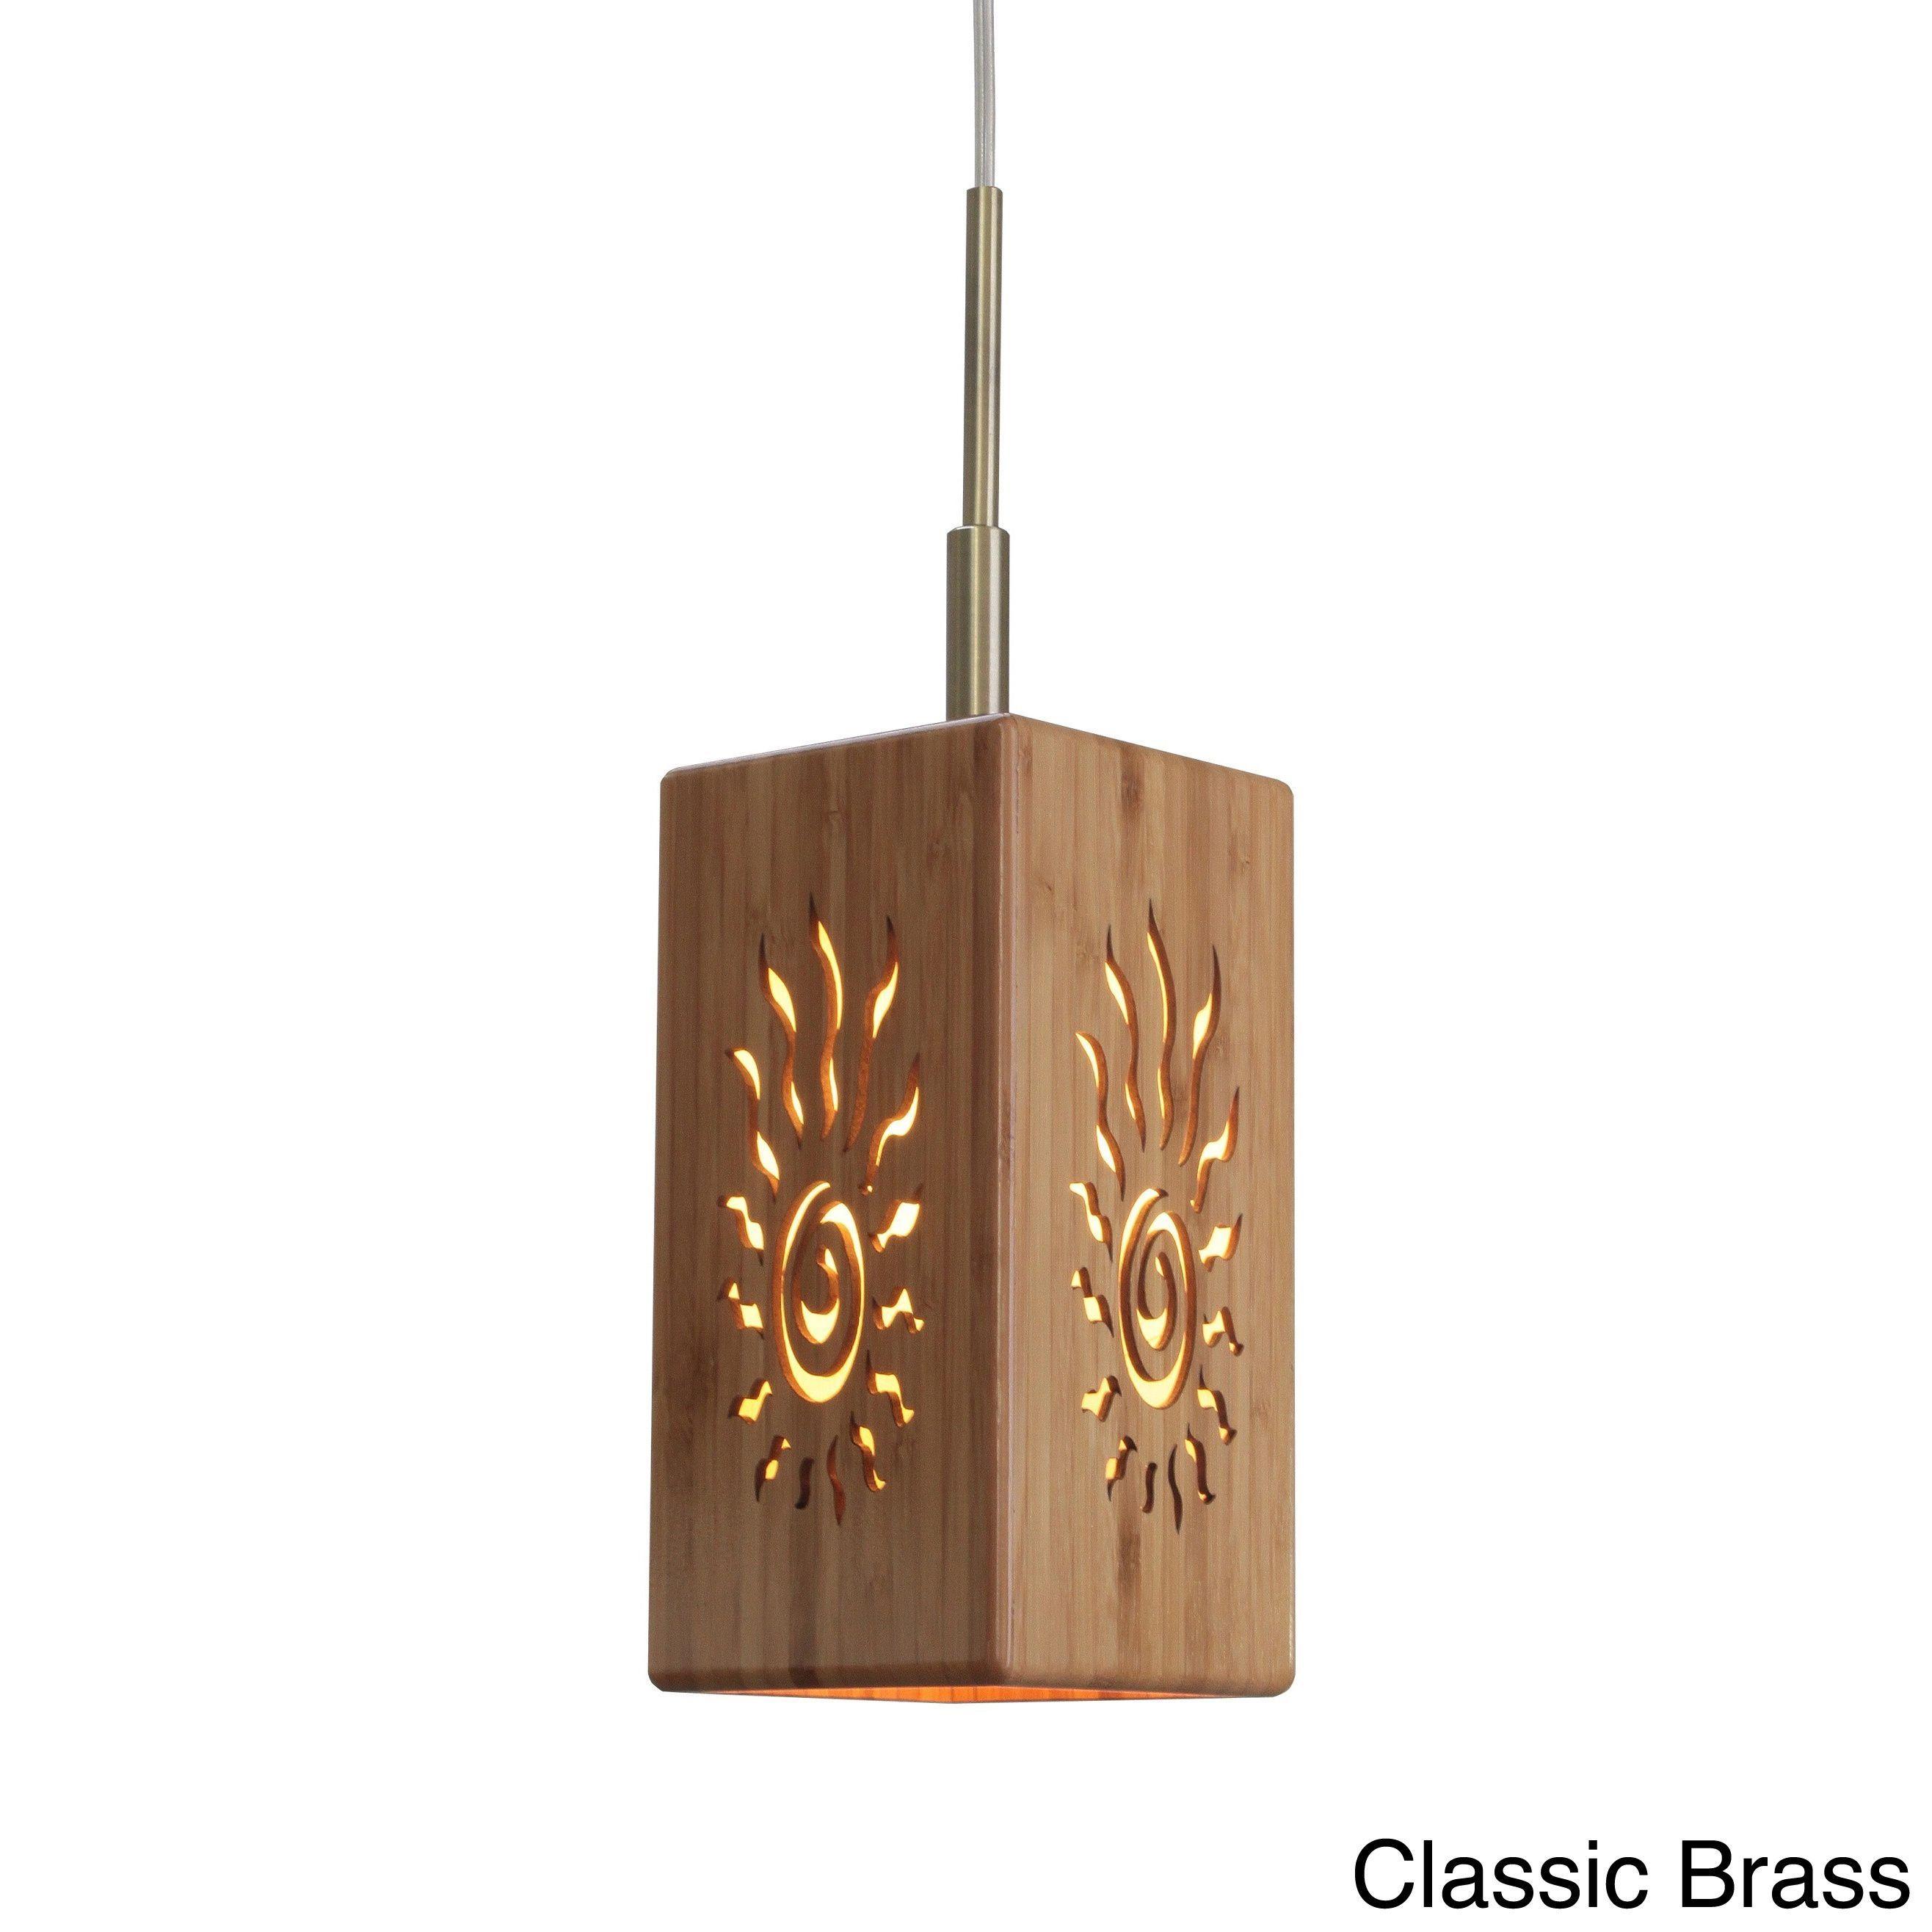 Woodbridge lighting lighthouse light bamboo pendant yellow